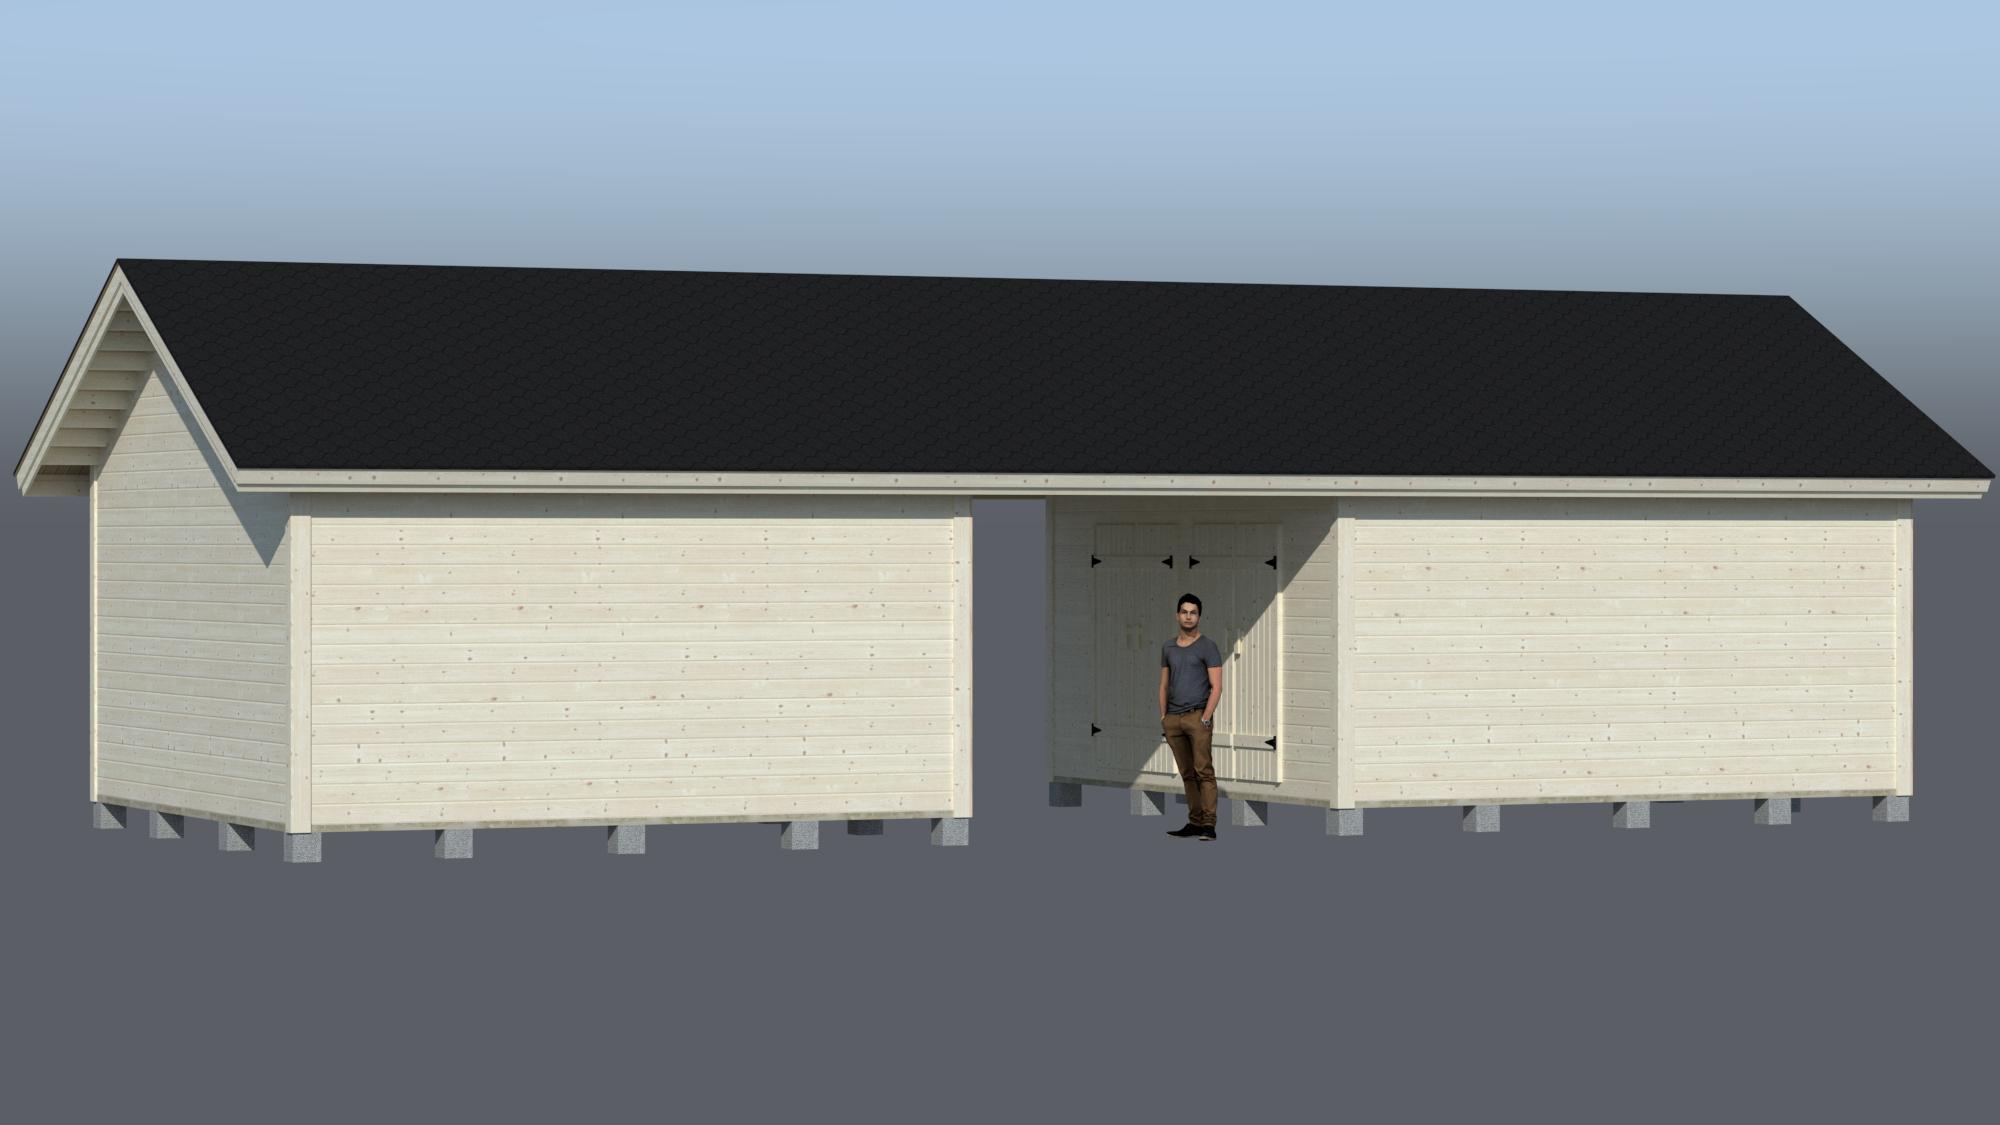 City parilato väliosalla 2x25m2 CNEK